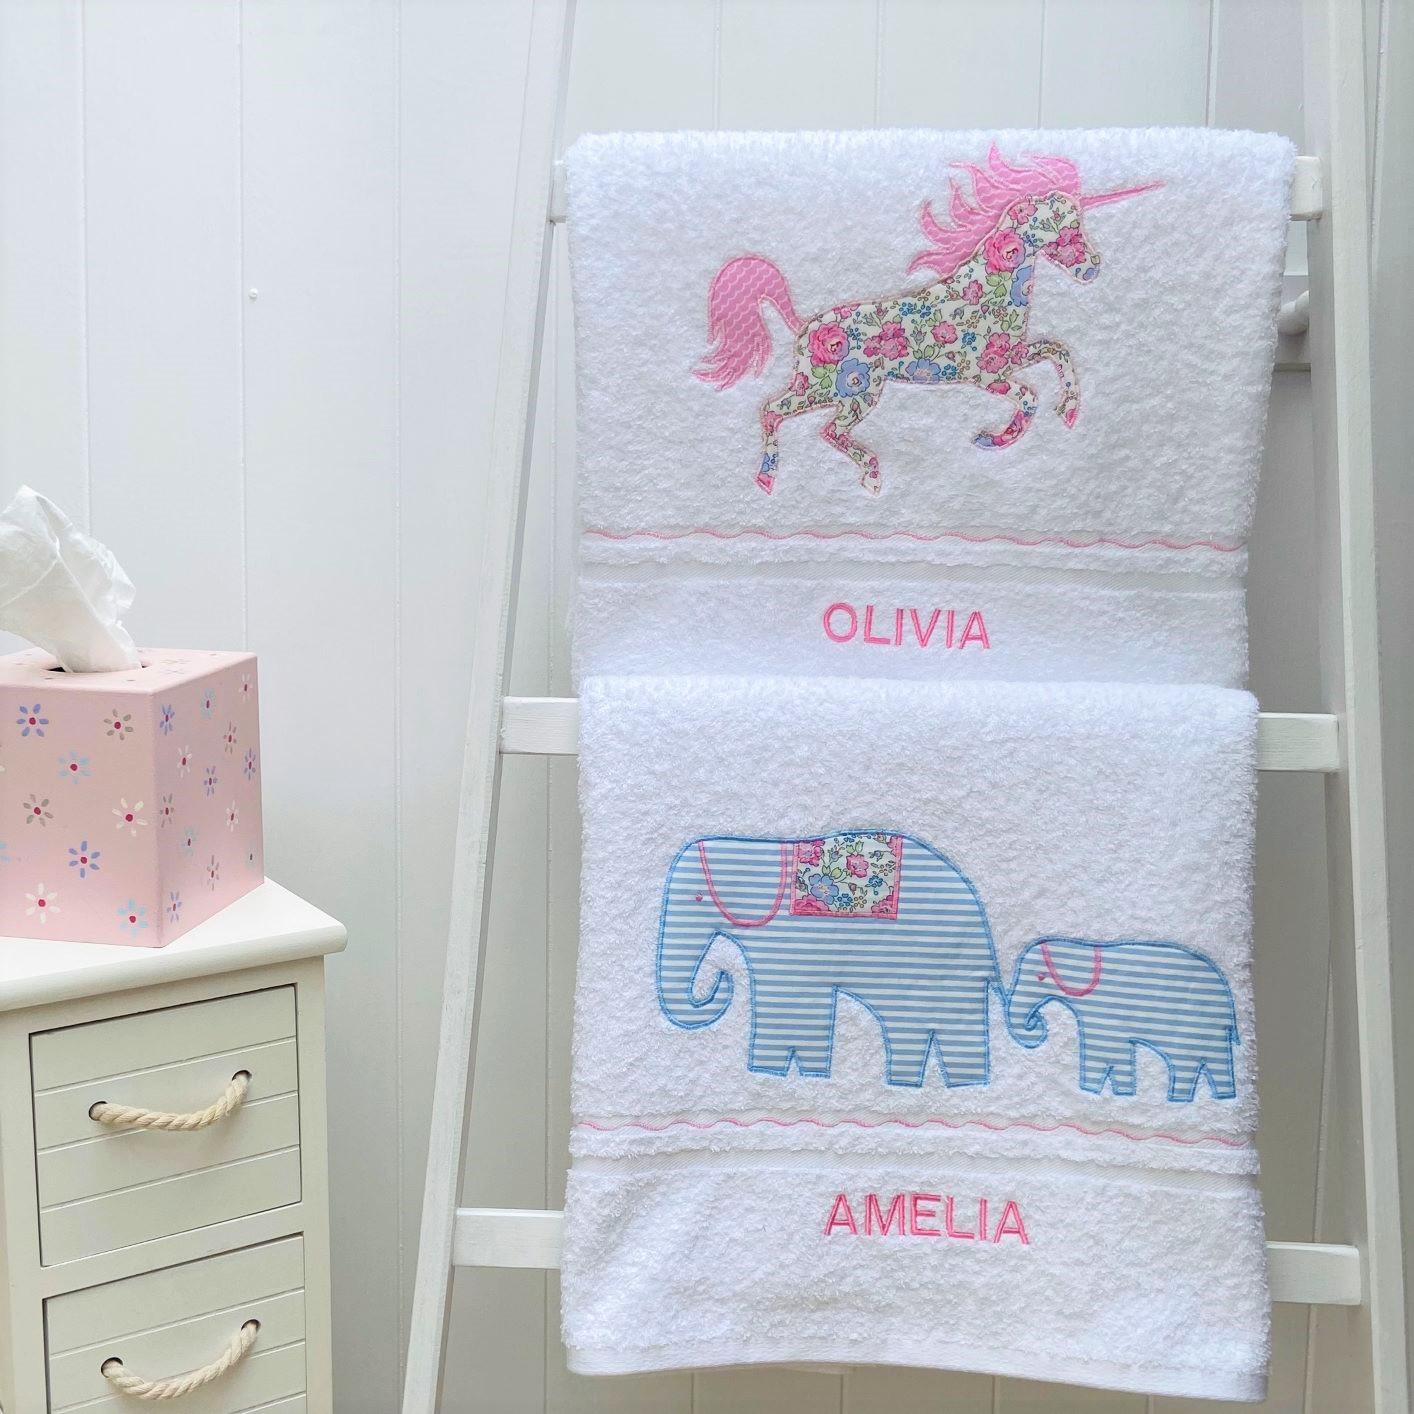 Personalised White Bath Towels